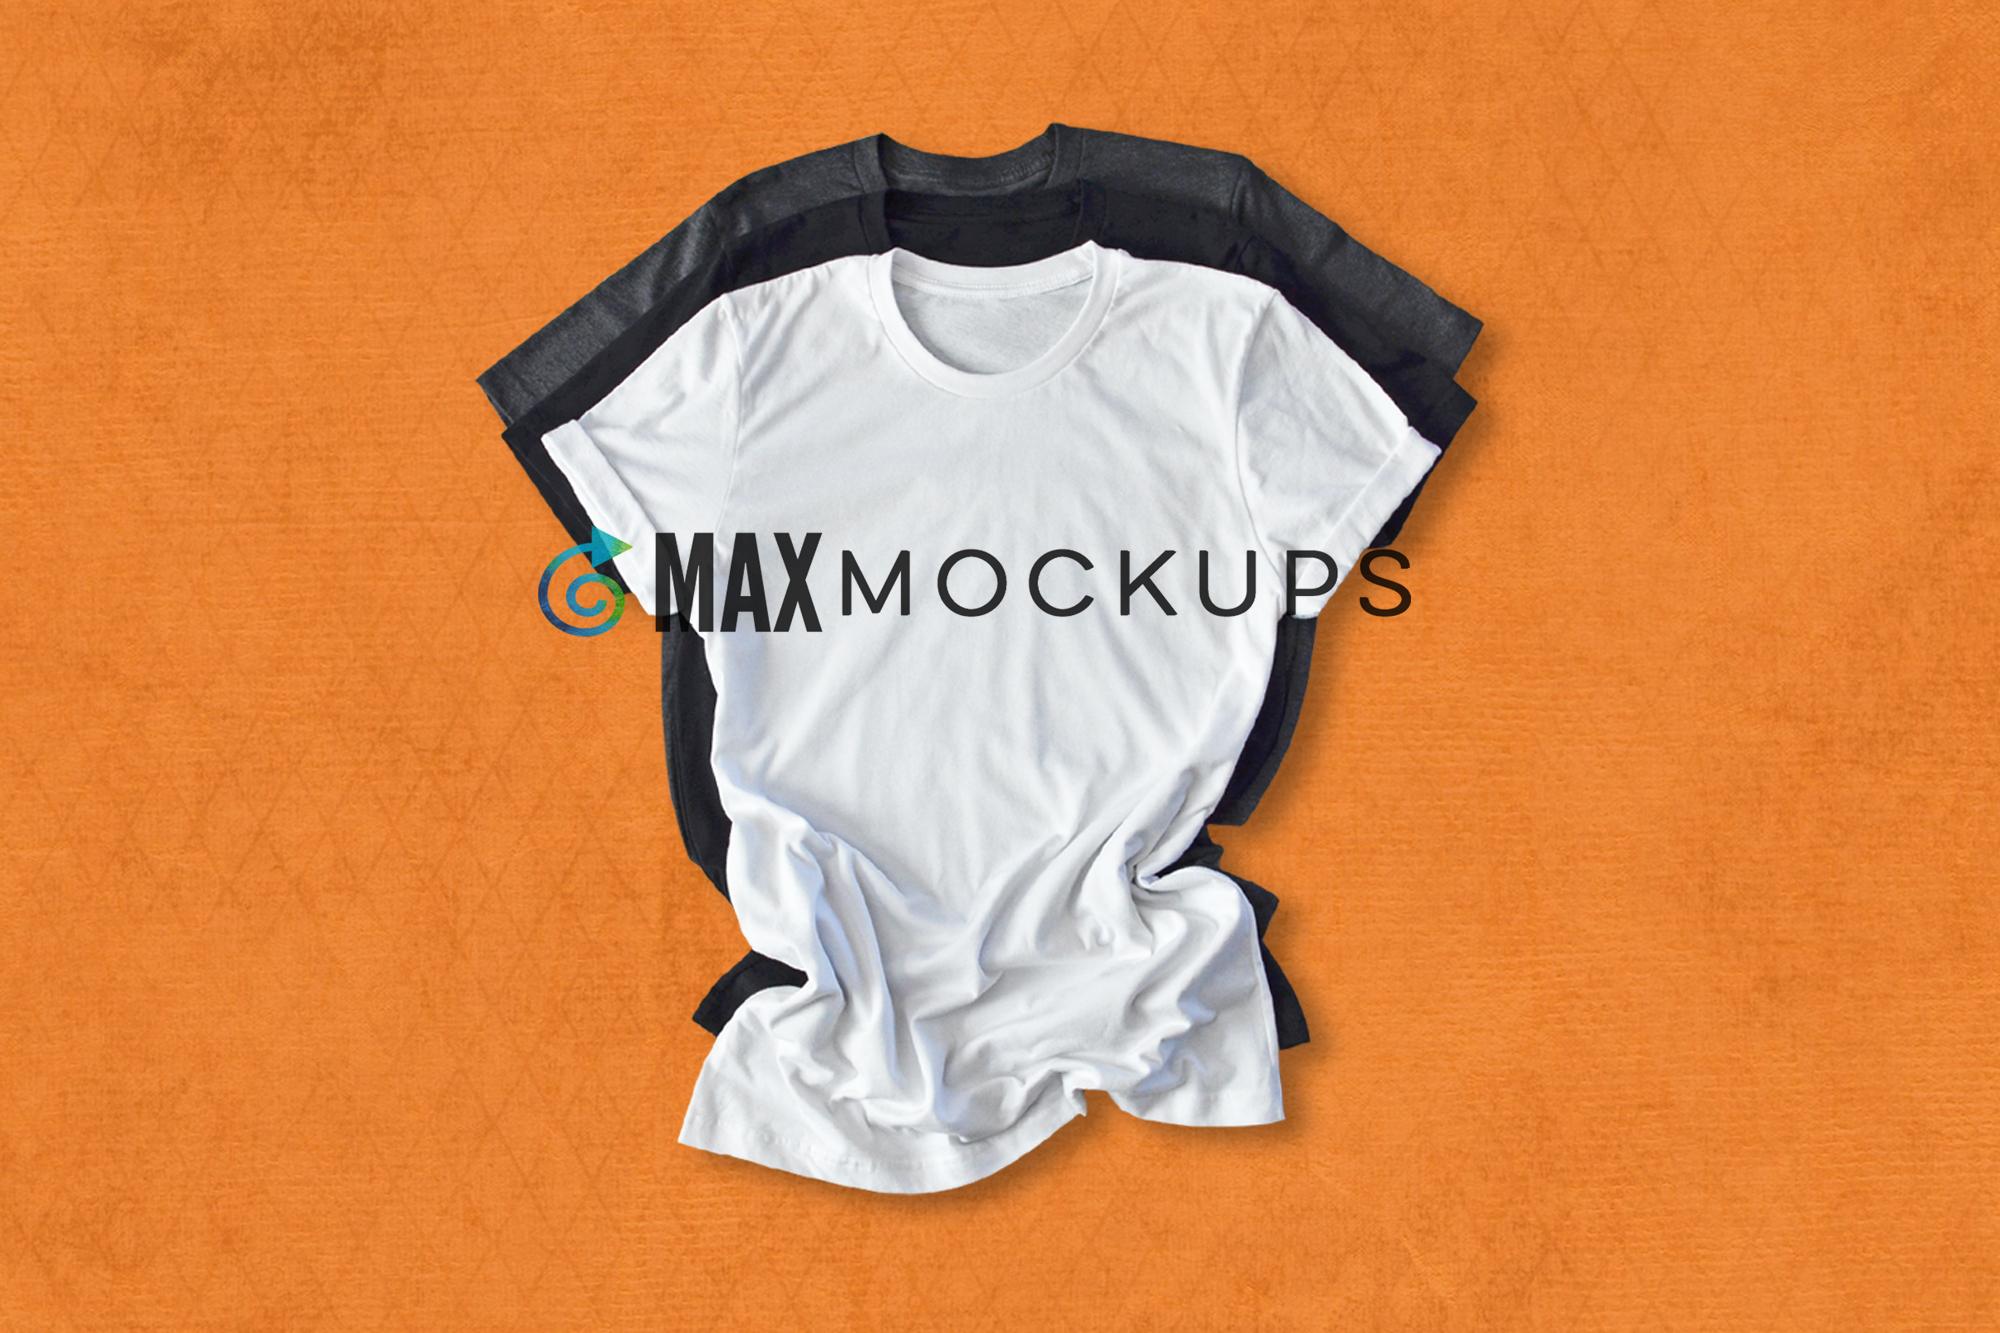 White shirt mock up, Halloween orange, women men stock photo example image 1